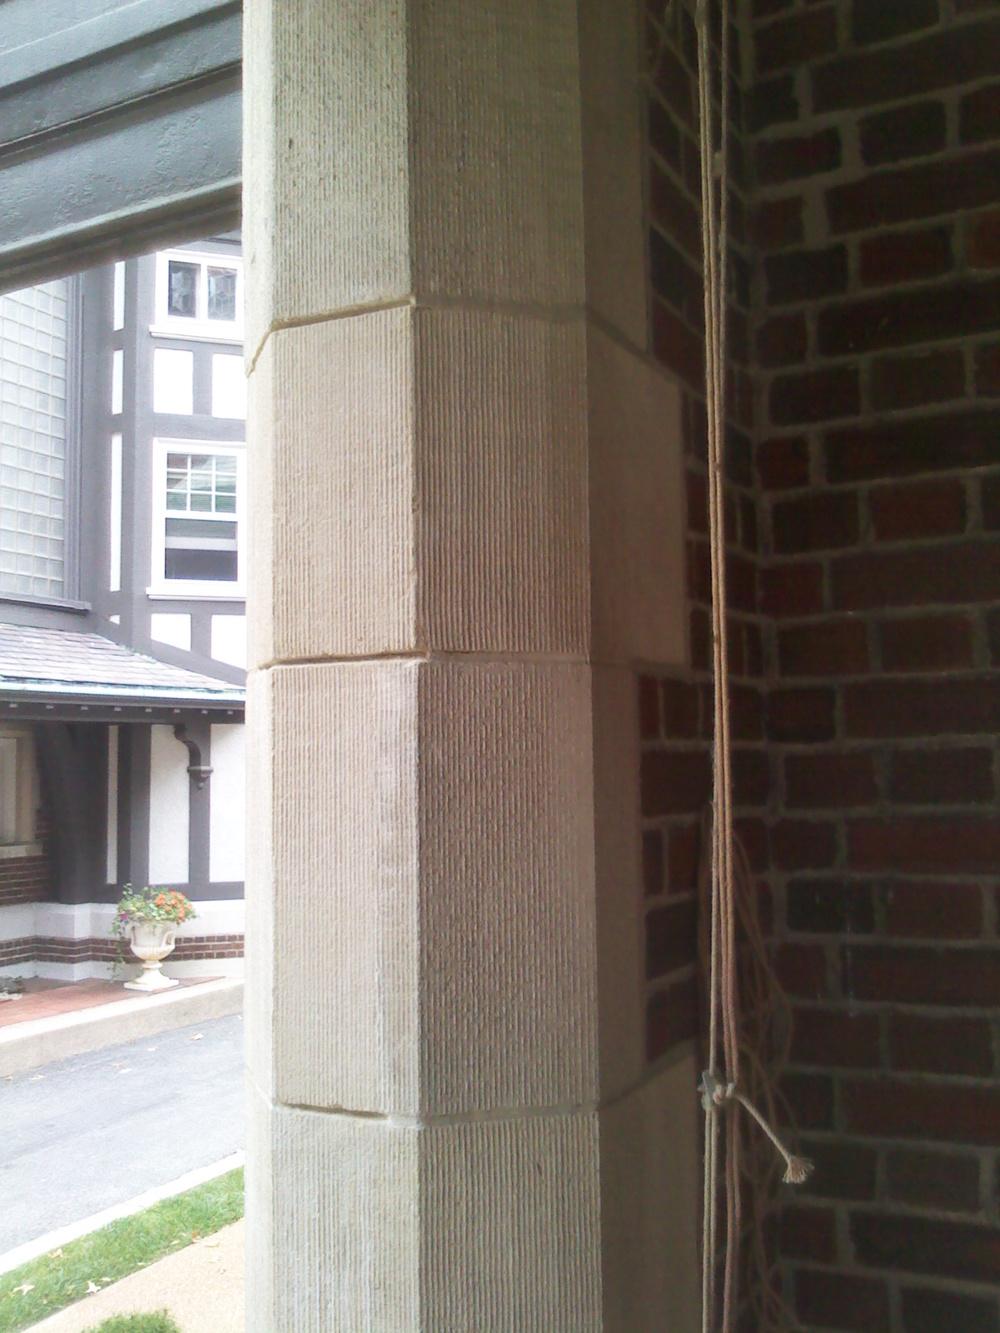 Cast stone quoins after restoration.  Lee Lindsey  Stone Works, St. Louis, MO